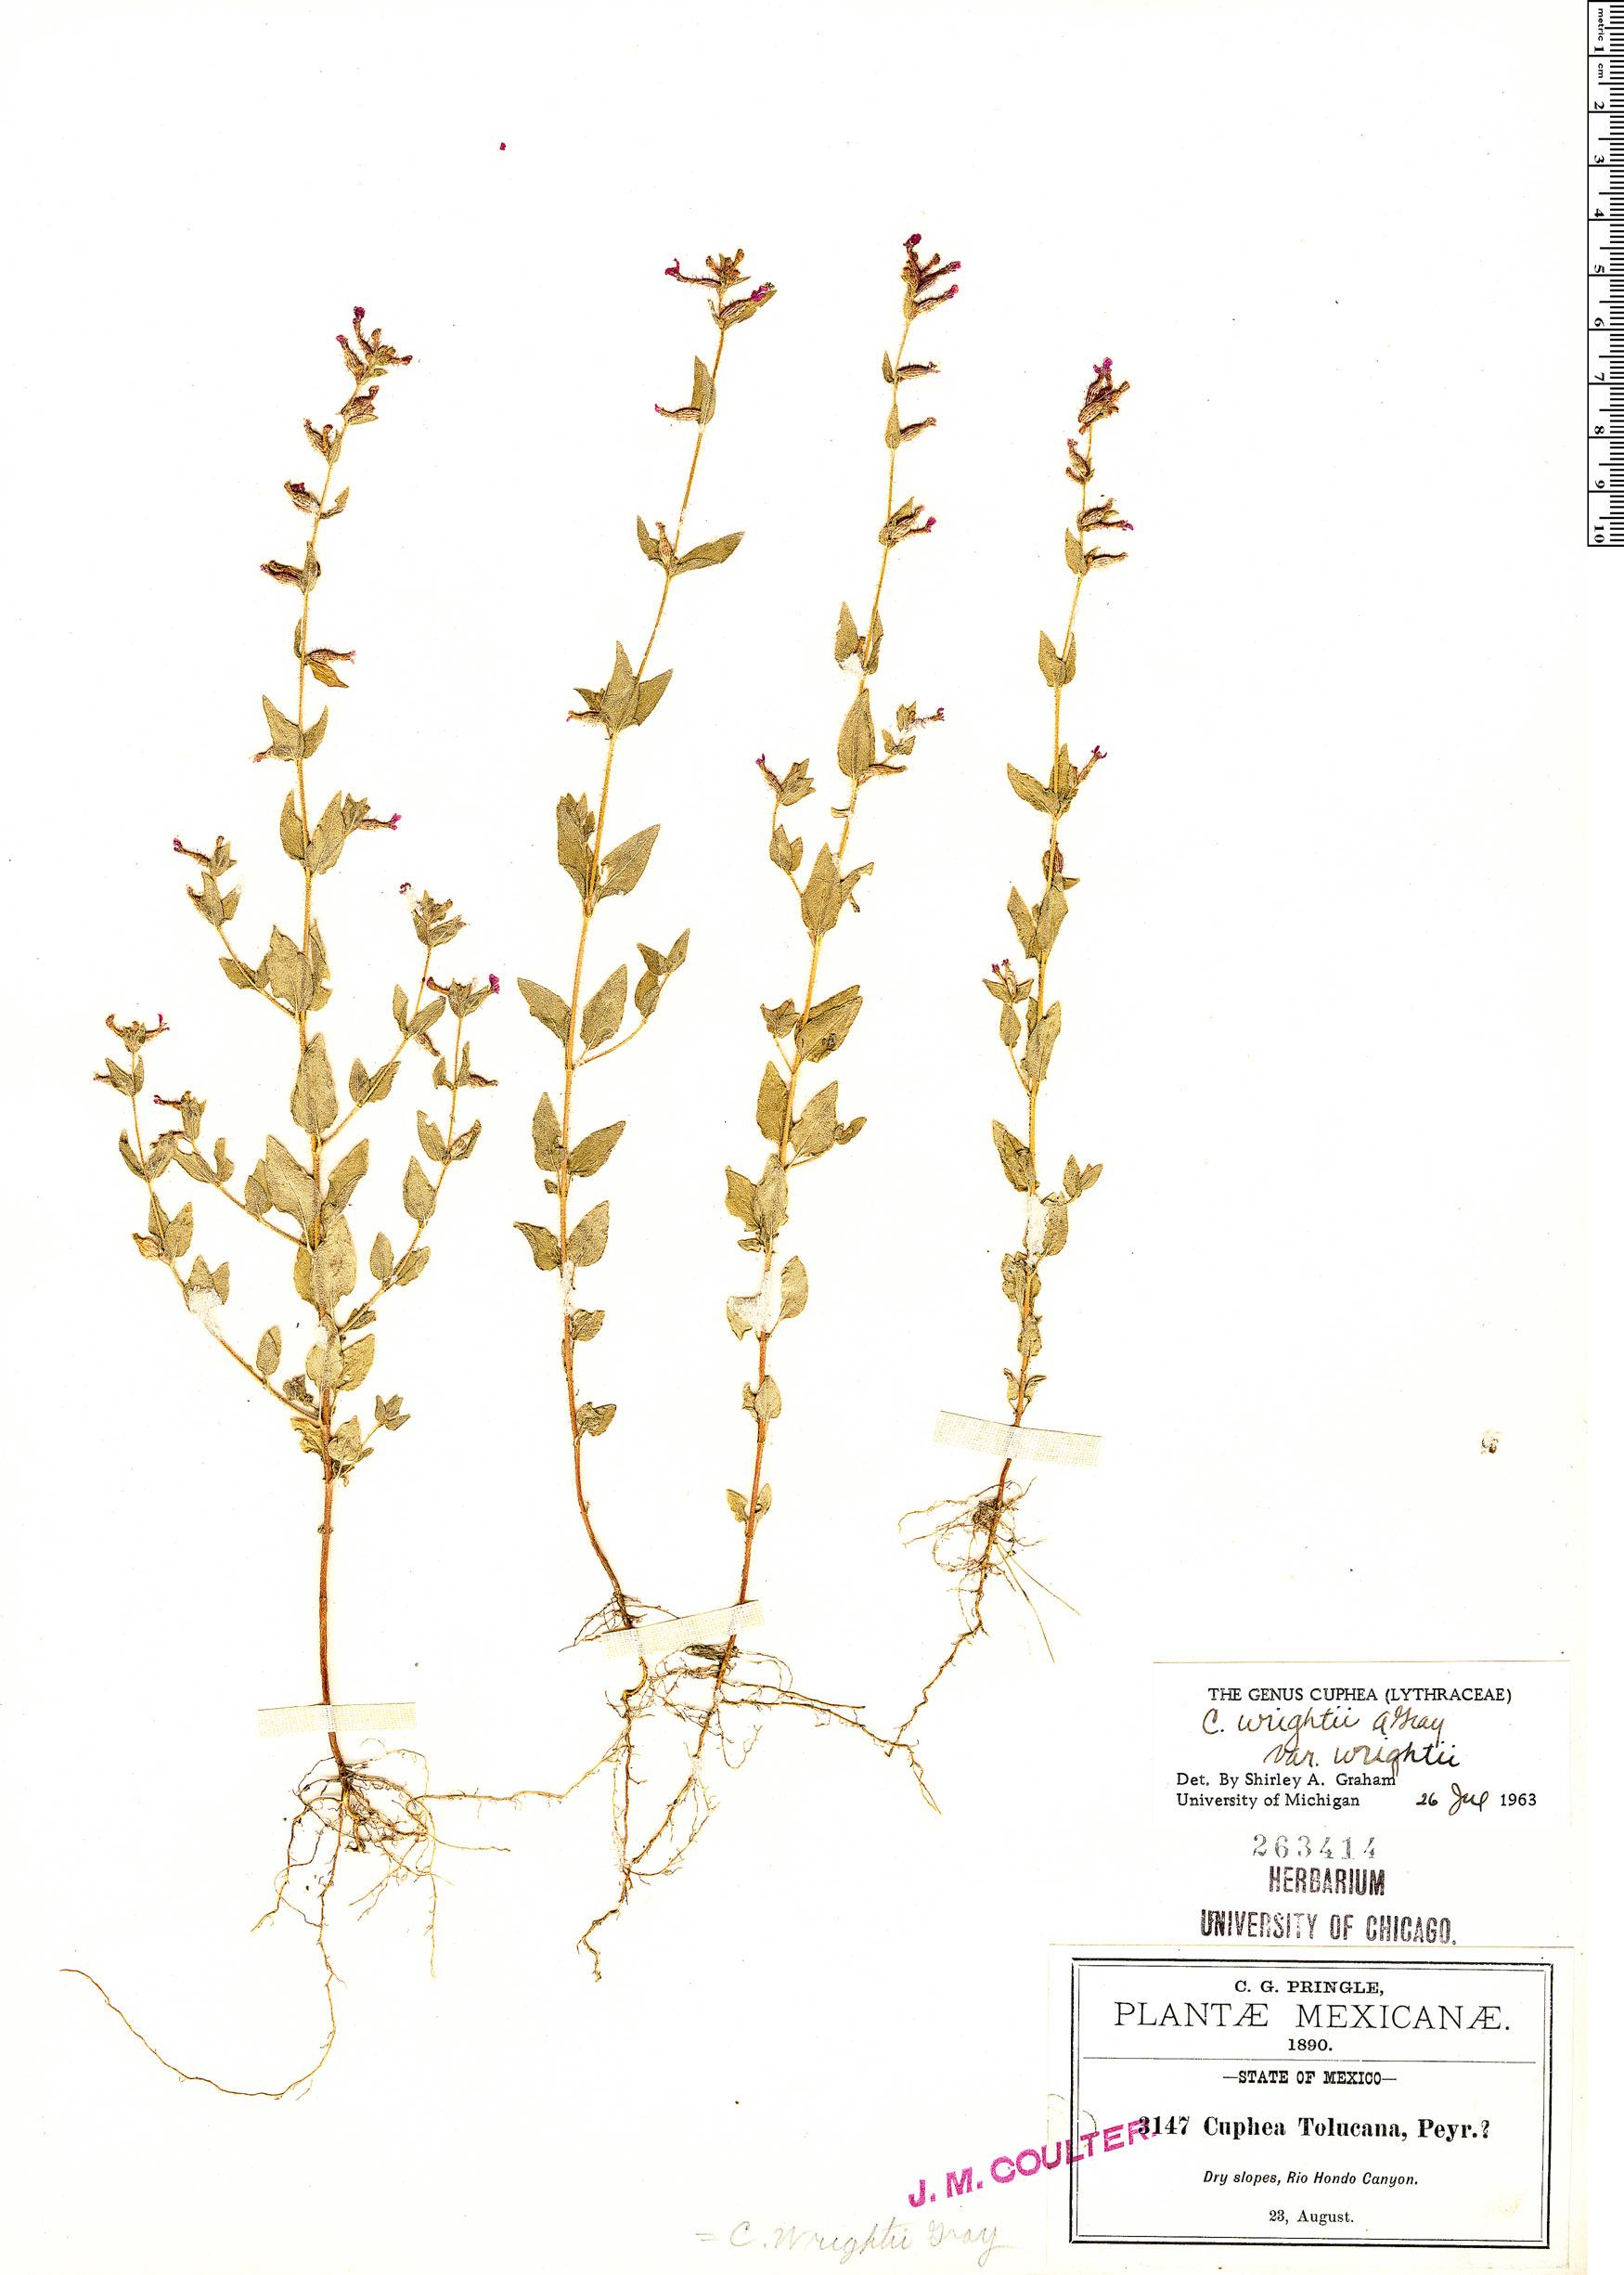 Specimen: Cuphea wrightii